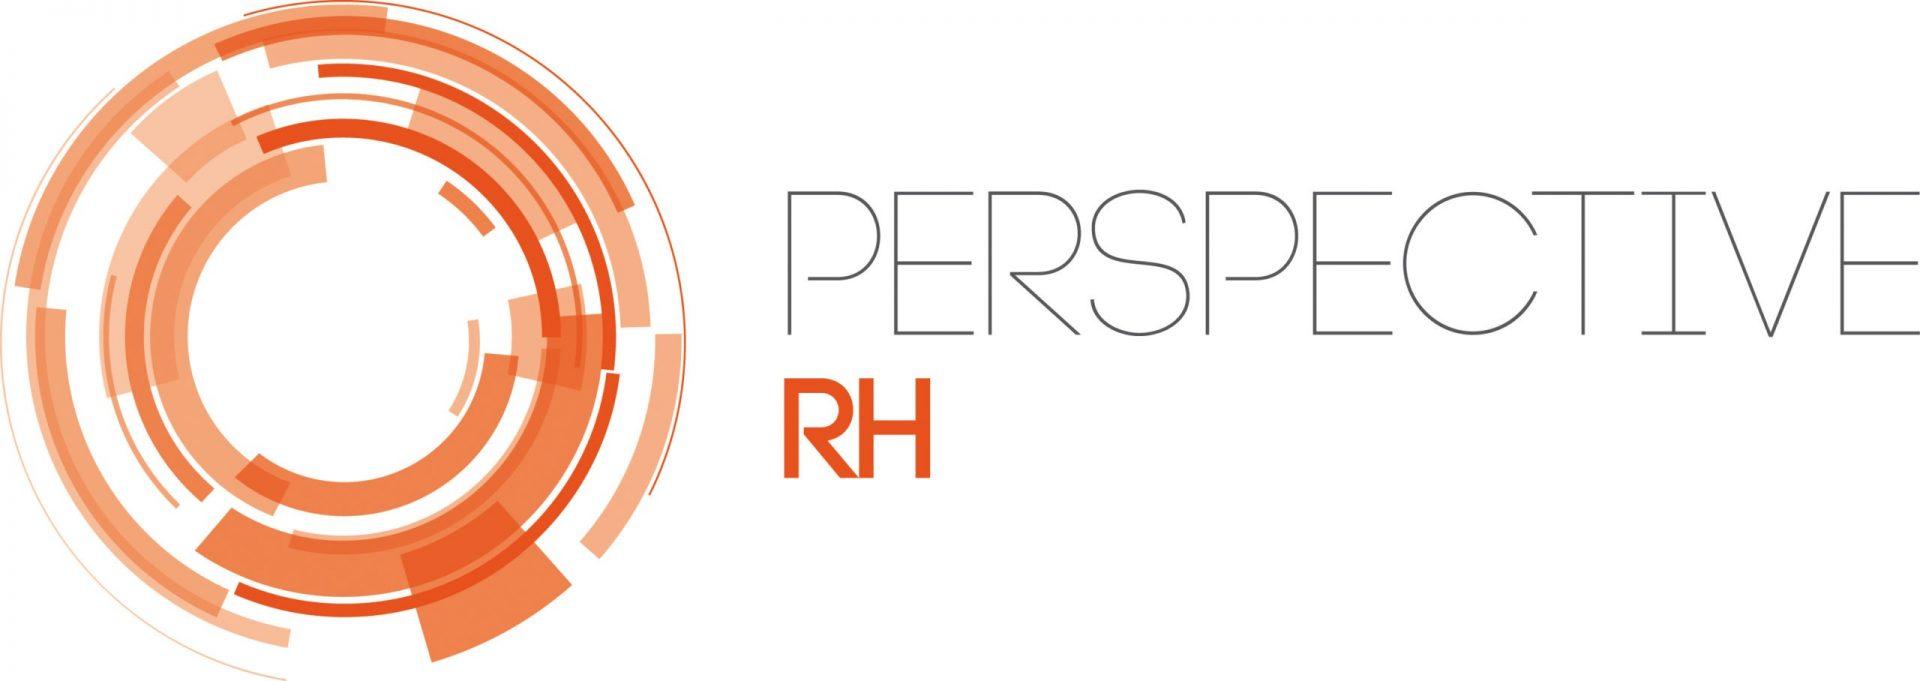 Logo RH horizontal